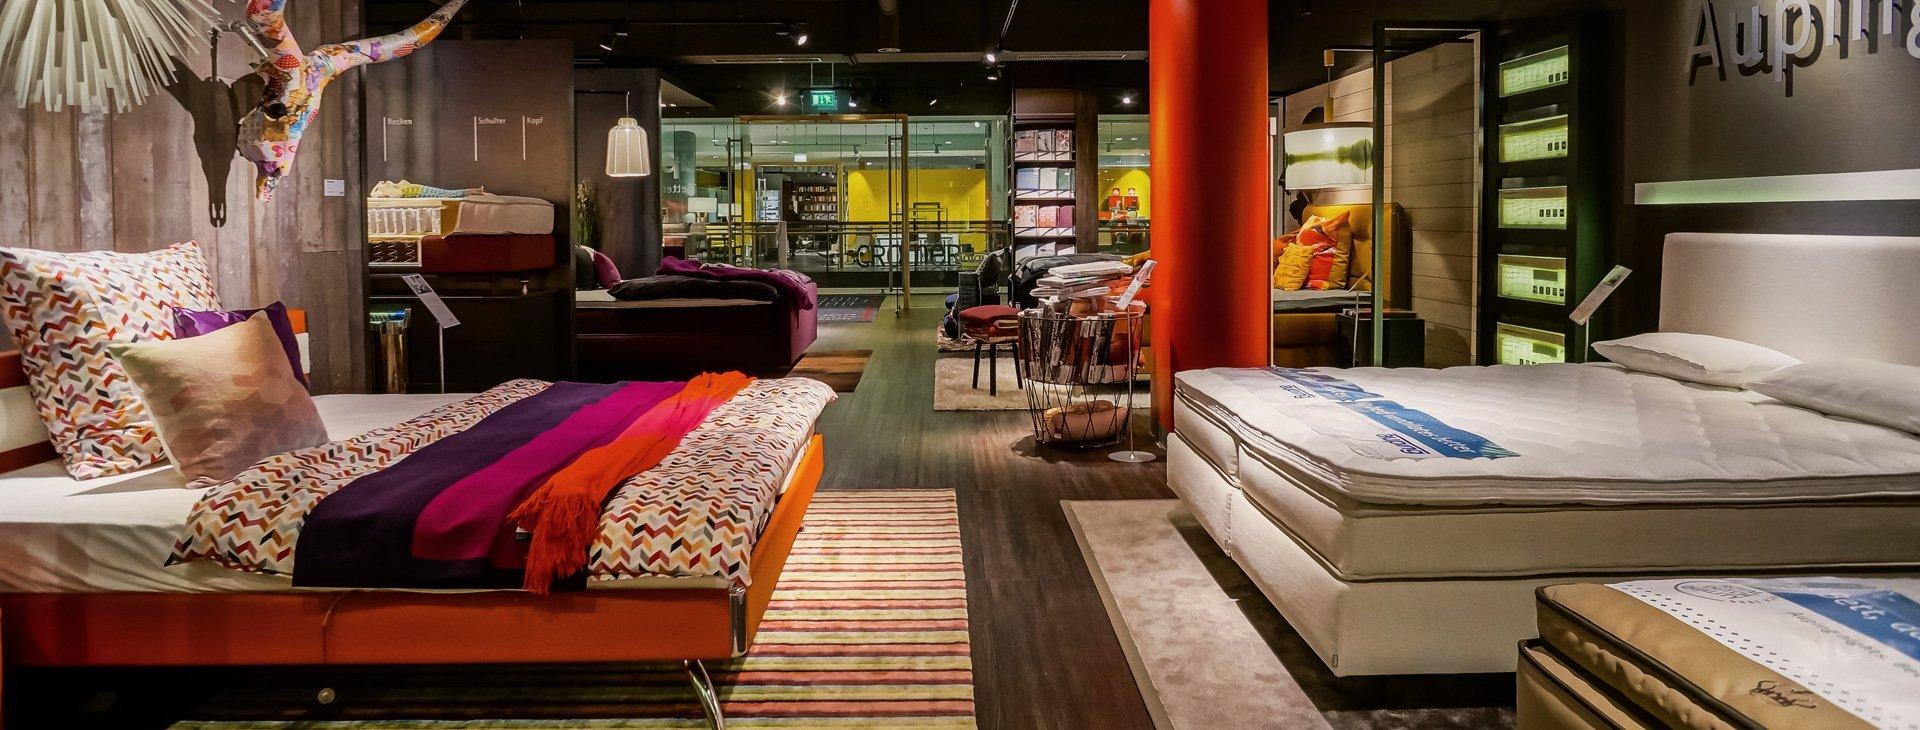 auping plaza berlin ihre stores im stilwerk berlin. Black Bedroom Furniture Sets. Home Design Ideas